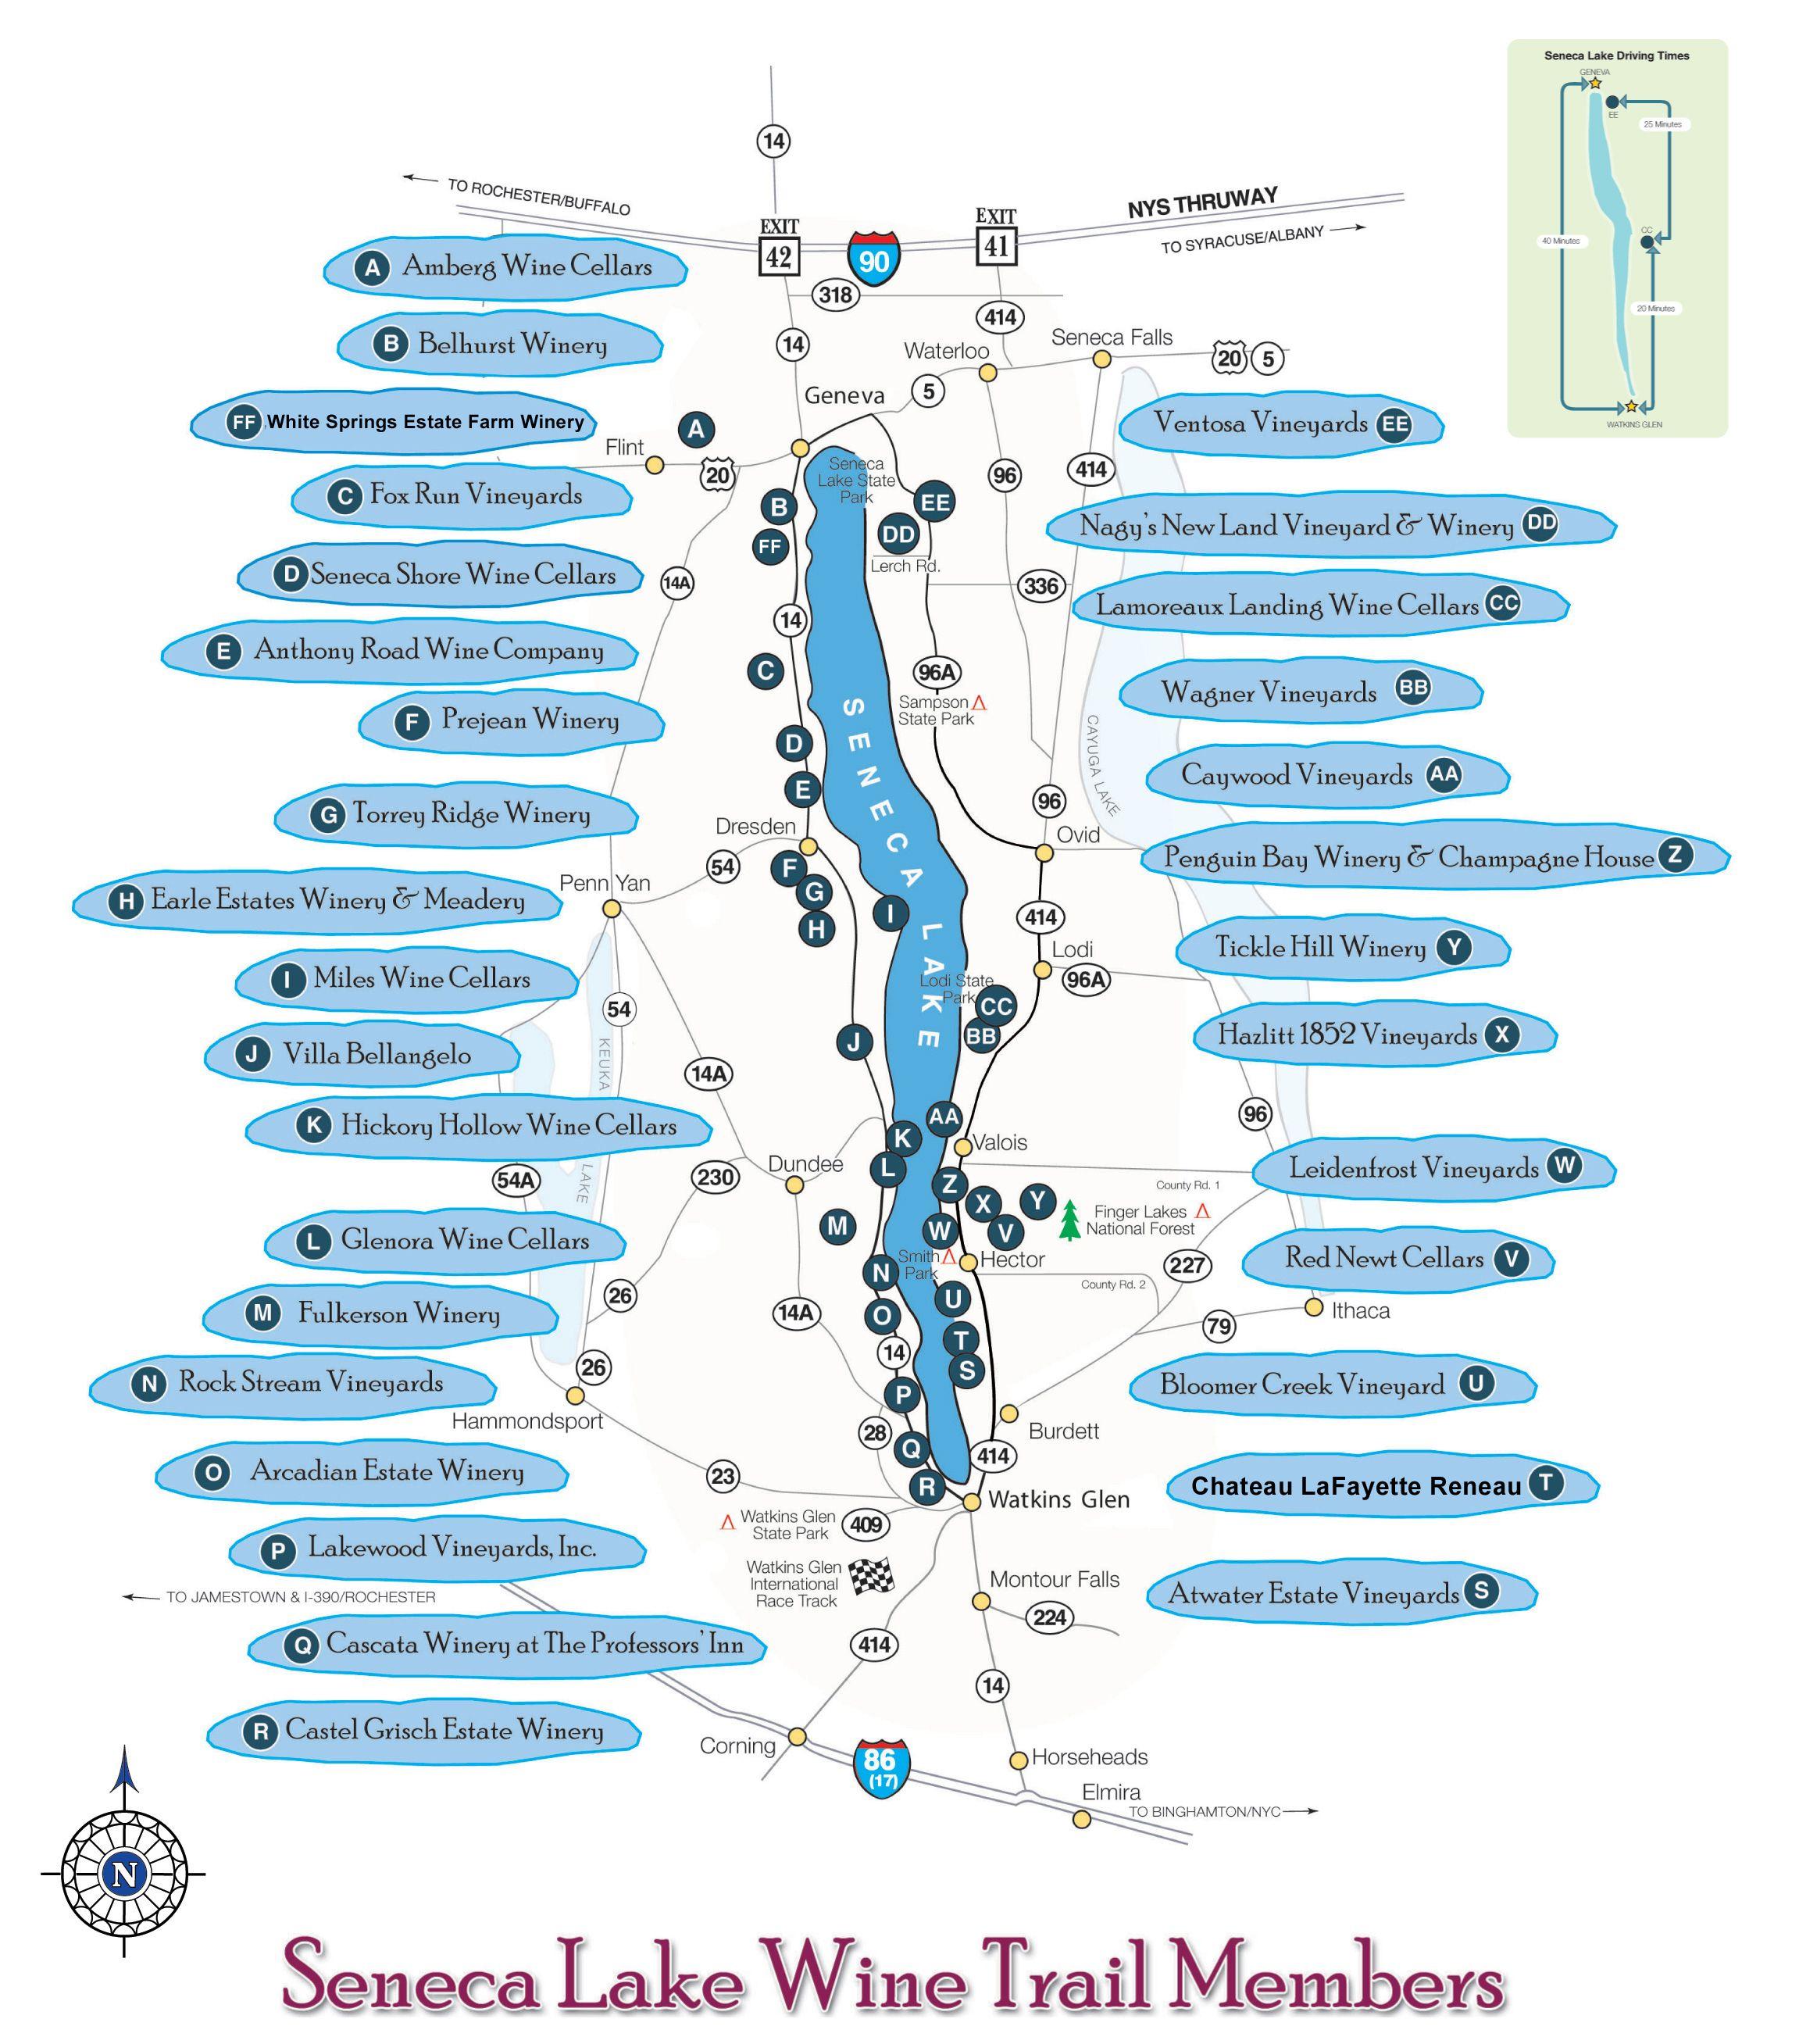 Map Of New York Wineries.Seneca Lake Wine Trail Map Seneca New York Mappery Future